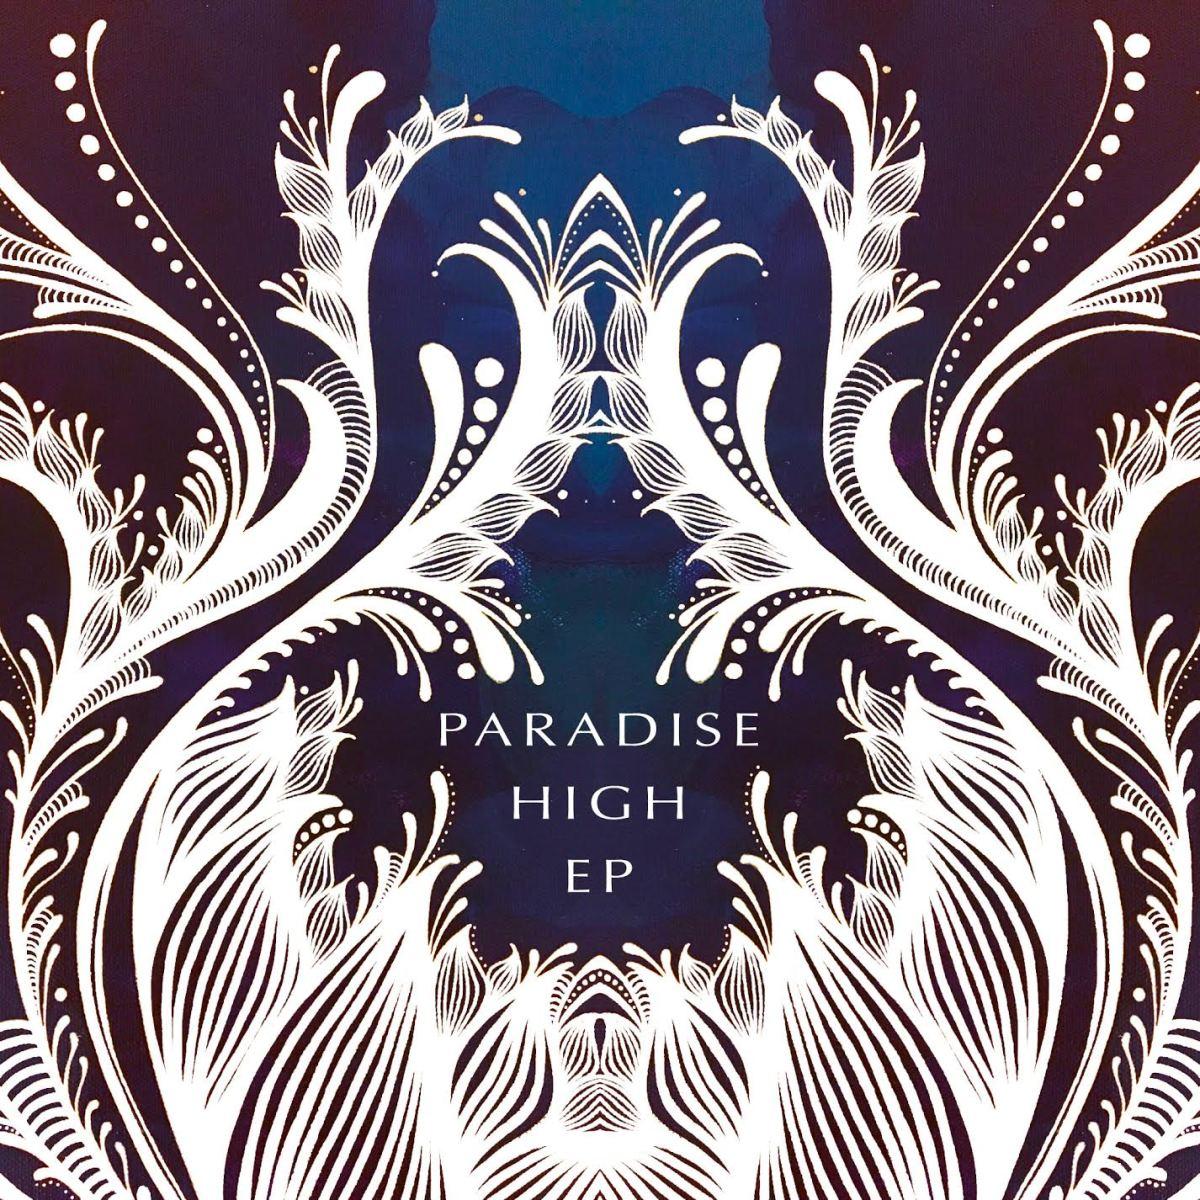 Paradise High EP Cover Art